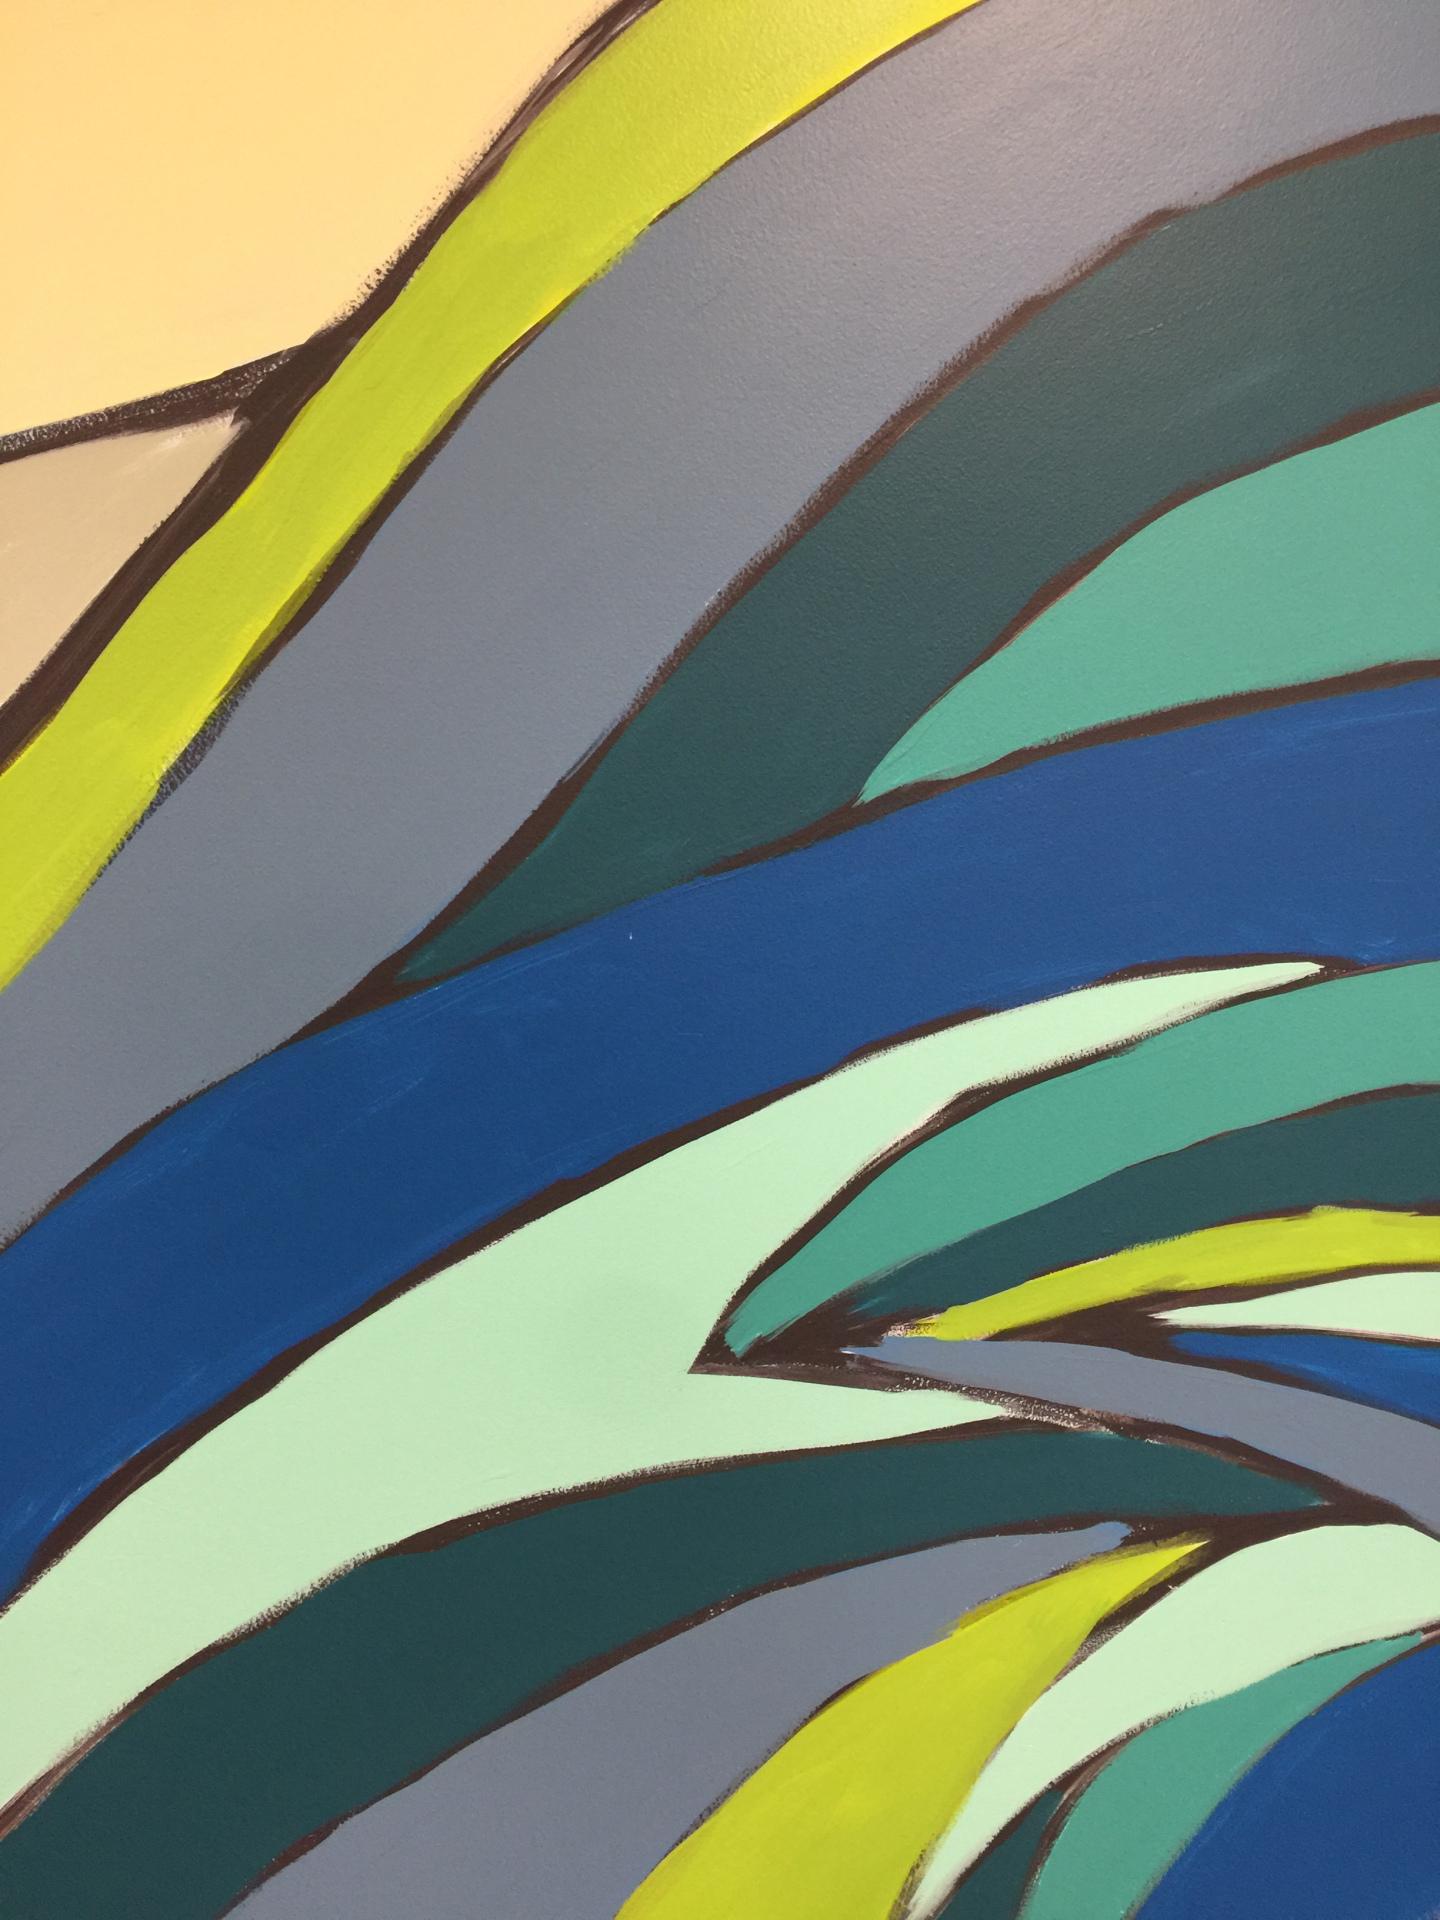 Mural close-up